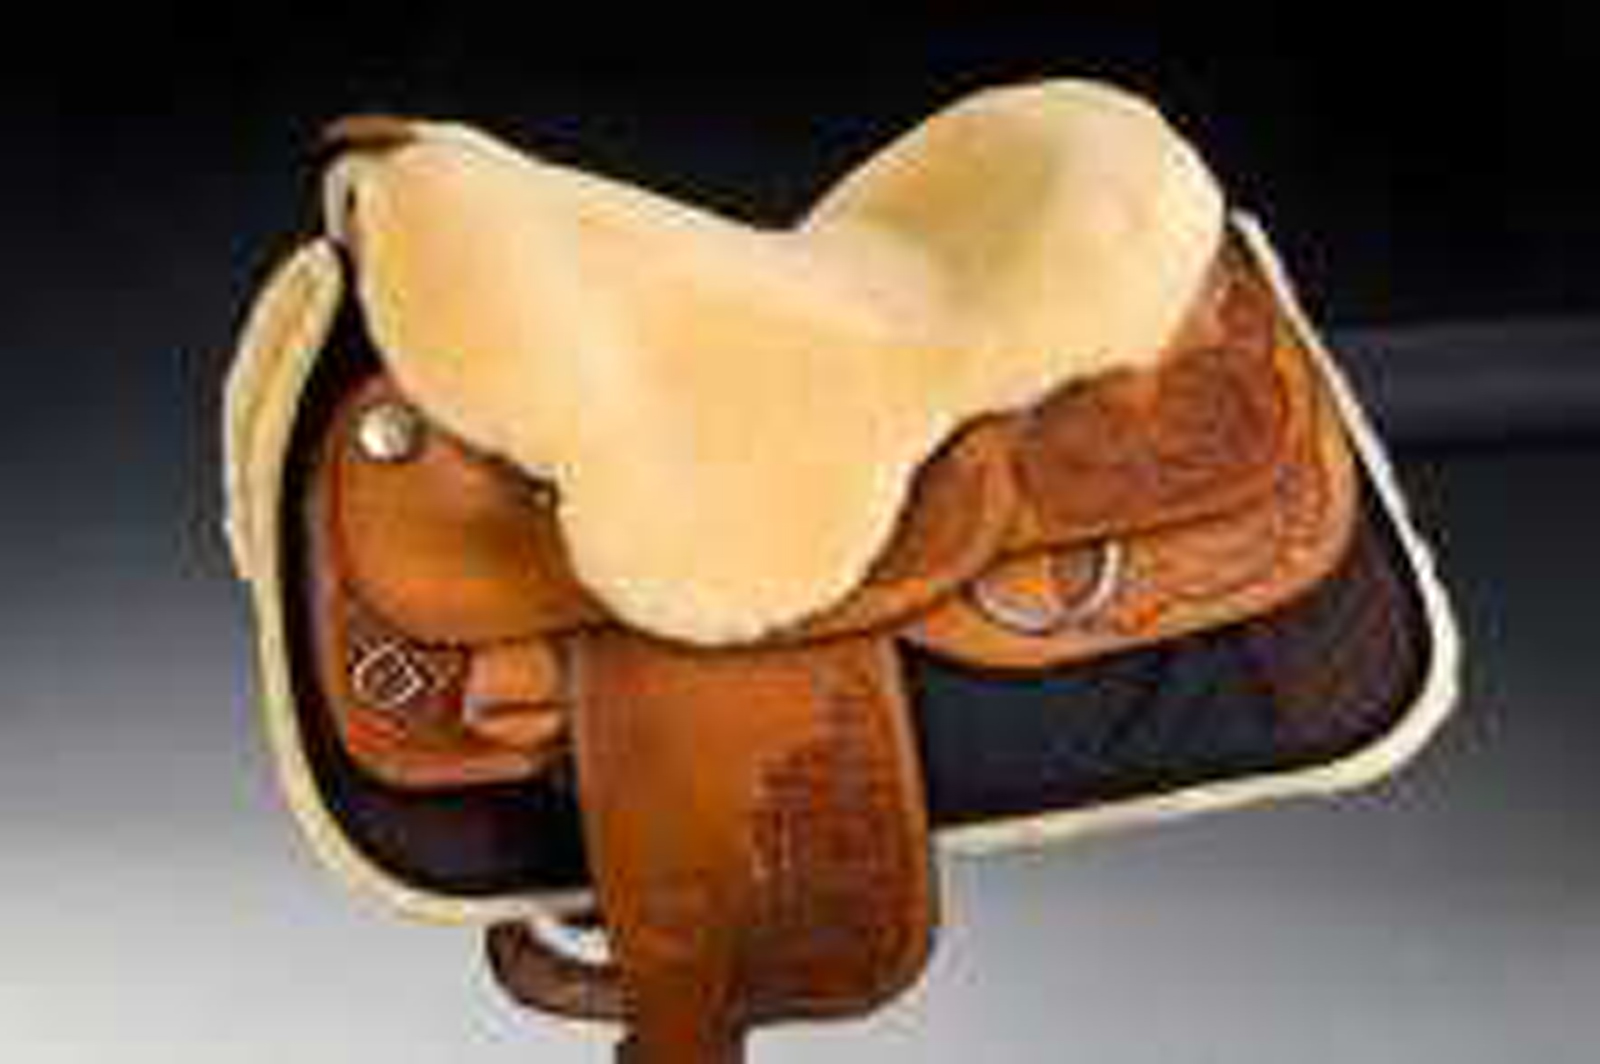 Christ Sheepskin Western Seat Saver with Horn Hole